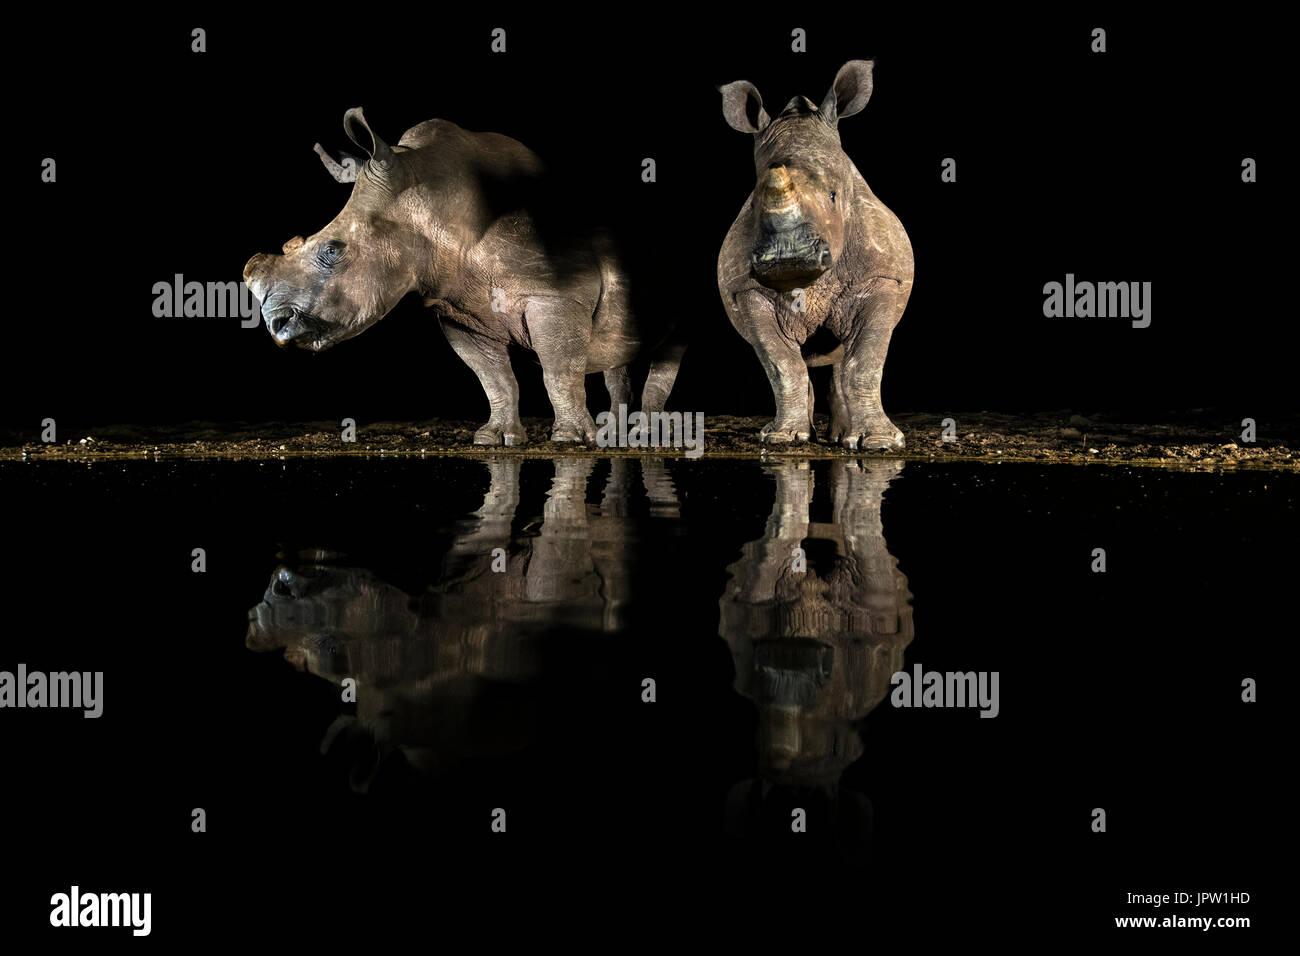 Le rhinocéros blanc (Ceratotherium simum) boire la nuit, KwaZulu-Natal, Afrique du Sud, mai 2017 Photo Stock